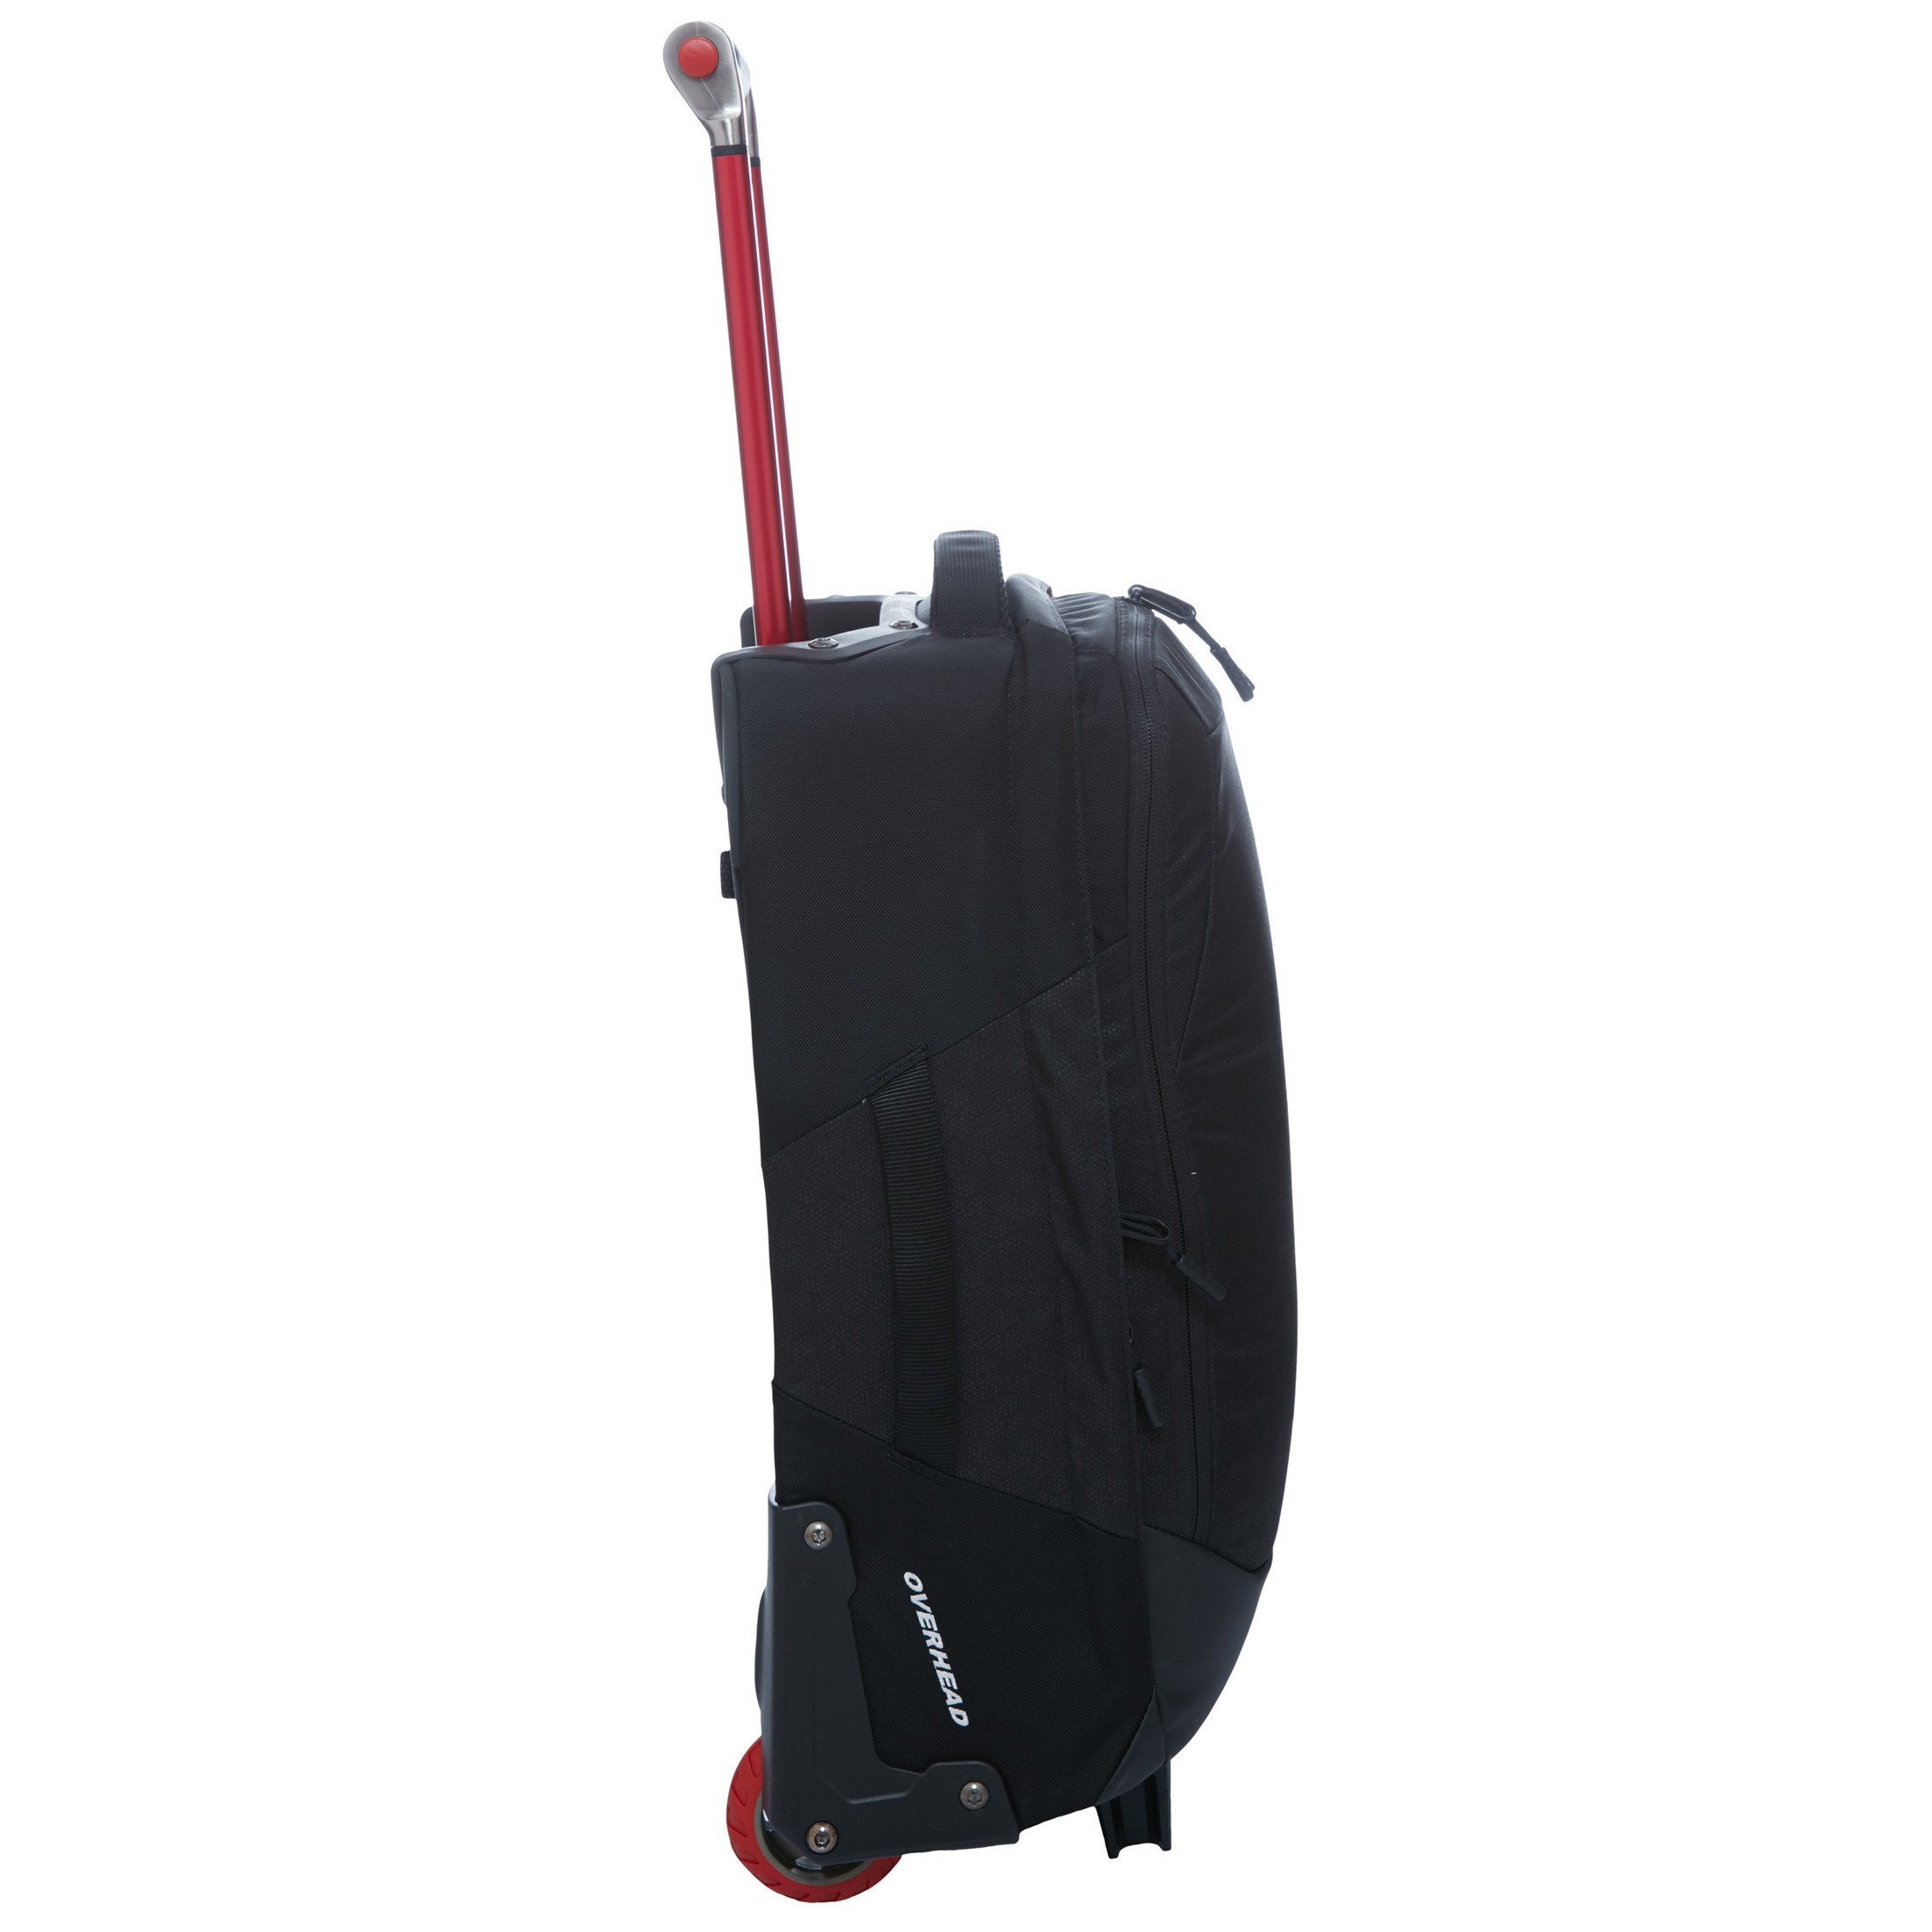 88bd59101ccb1 Torba na kółkach OVERHEAD black   podróże i trekking \ torby ...